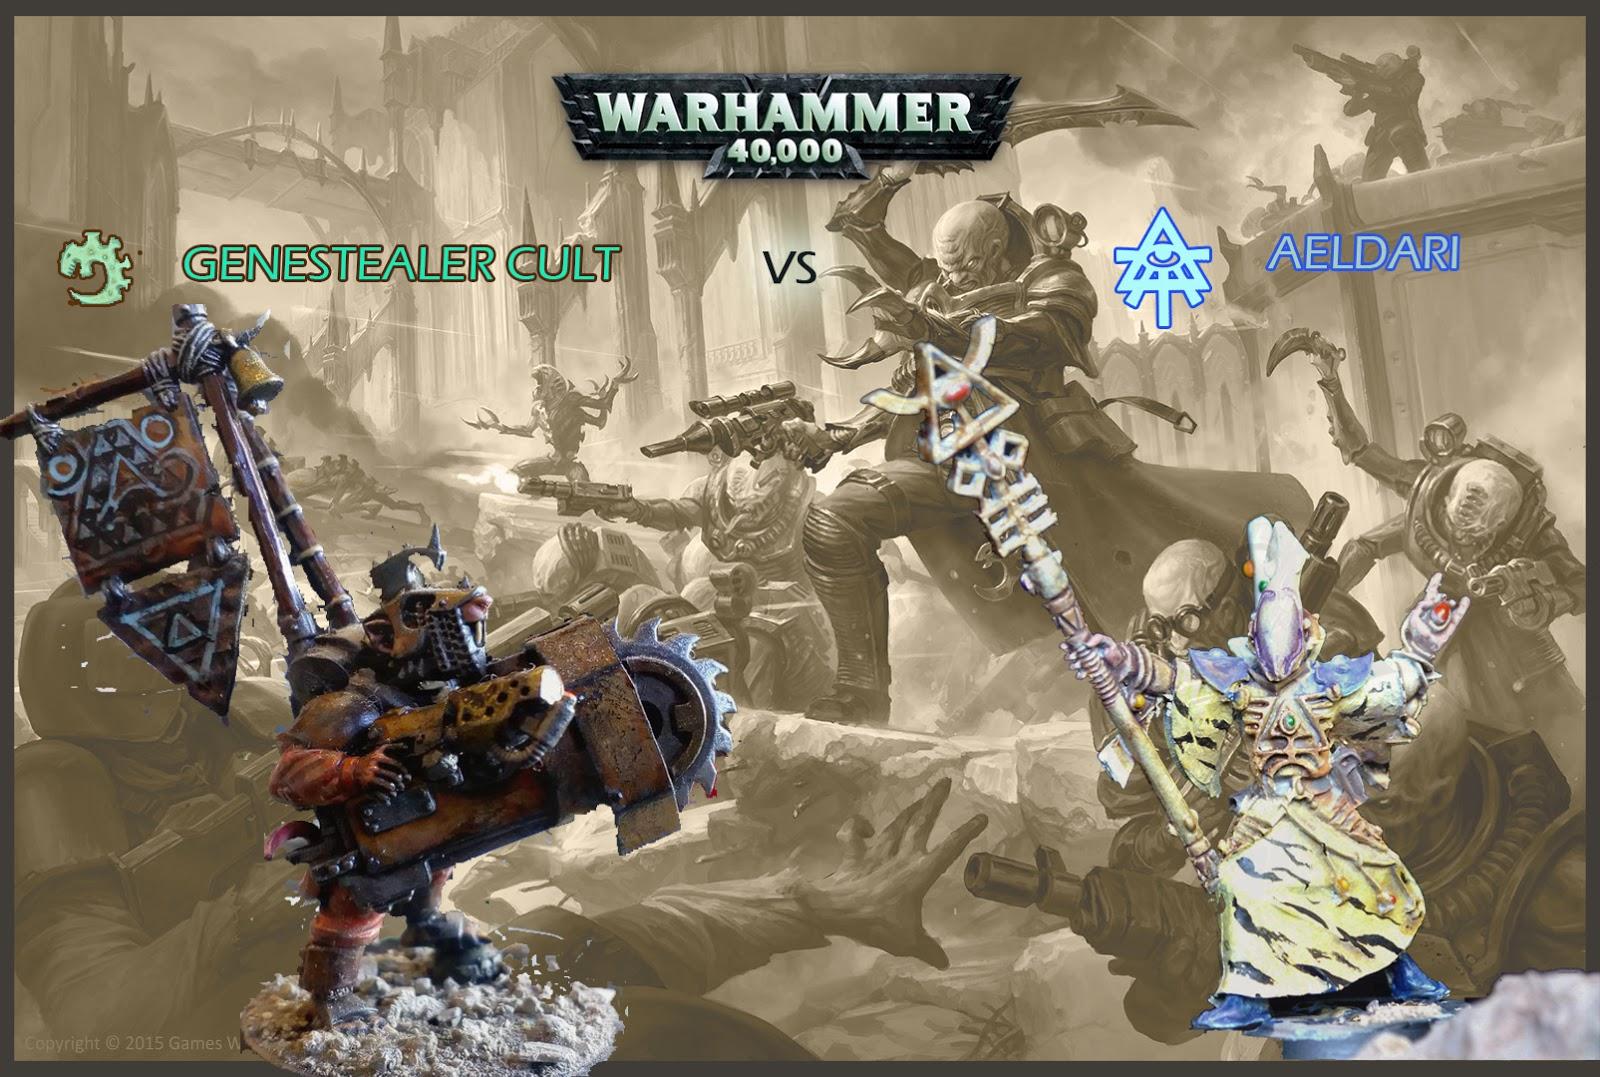 Frontline News – Warhammer 40K 8th edition Aeldari vs